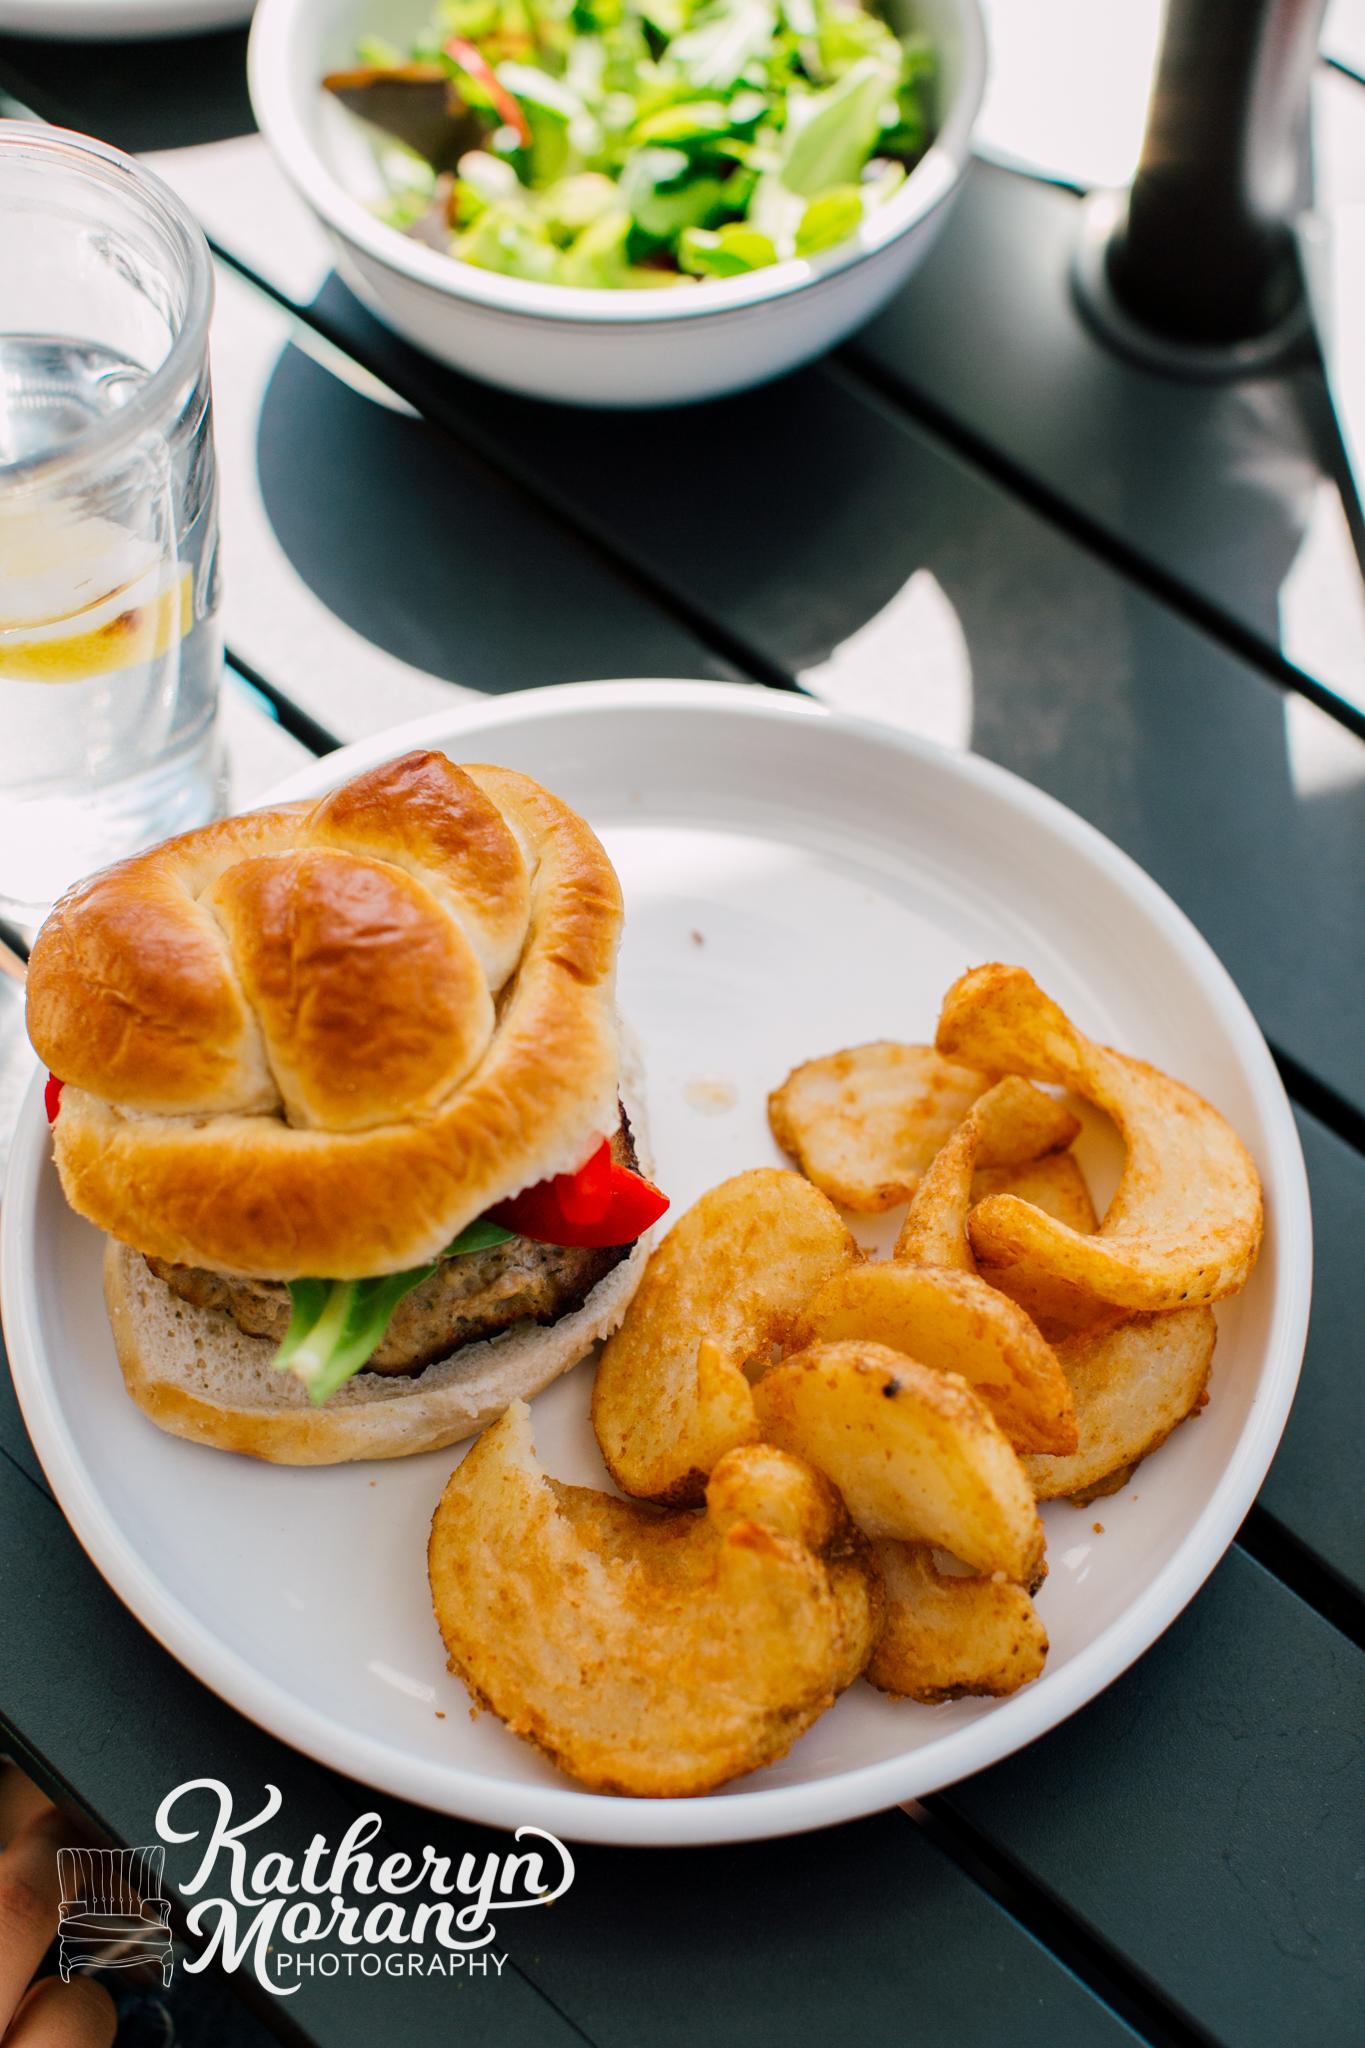 dream-dinners-katheryn-moran-2019-lifestyle-9.jpg